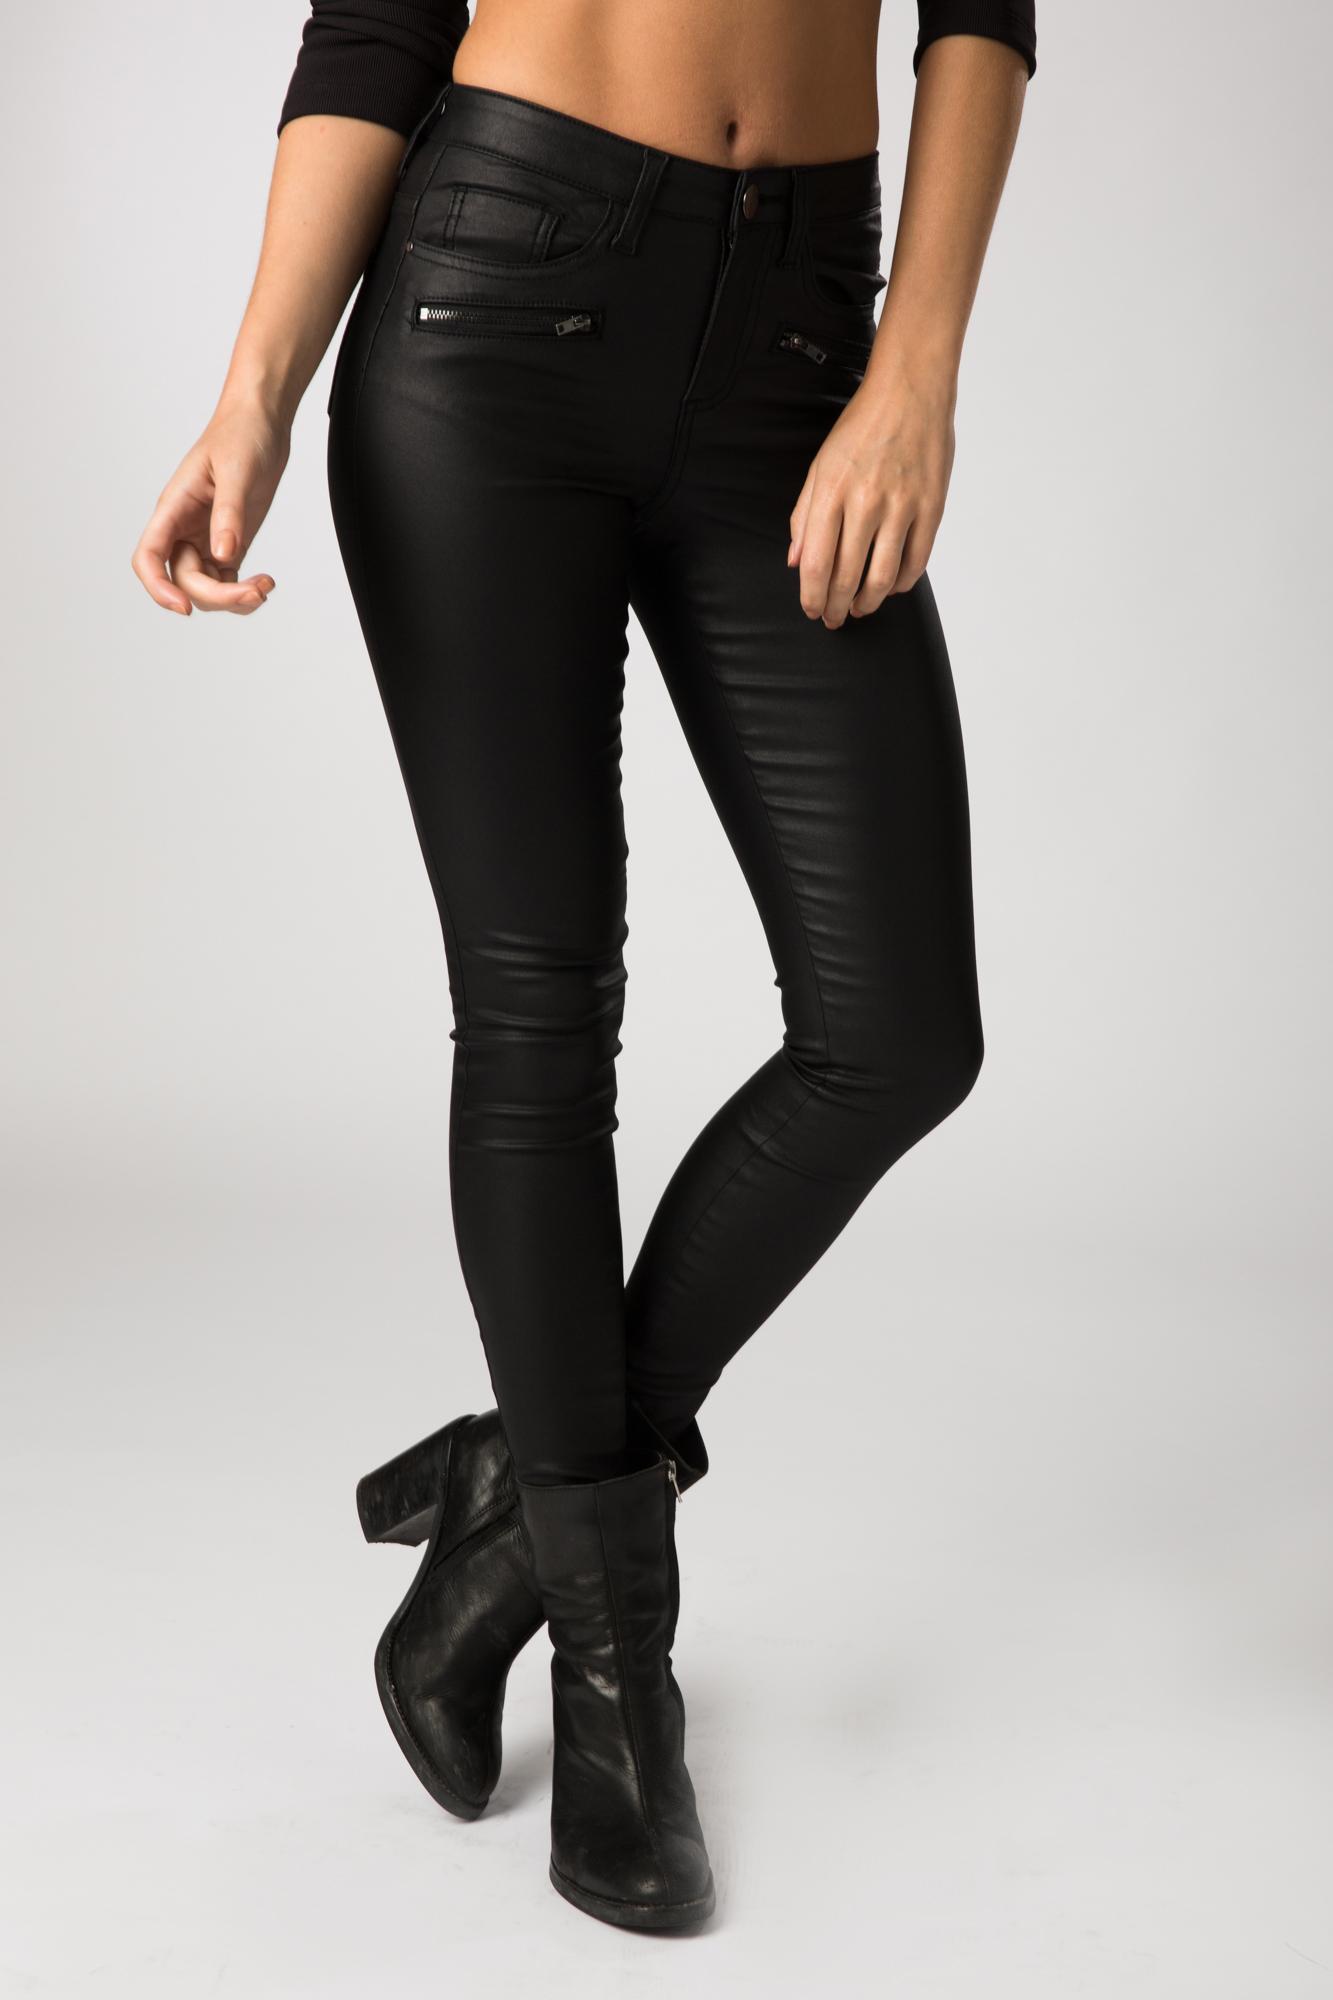 Fashion Union Womens Giraffe Coated Black Skinny Jean | EBay